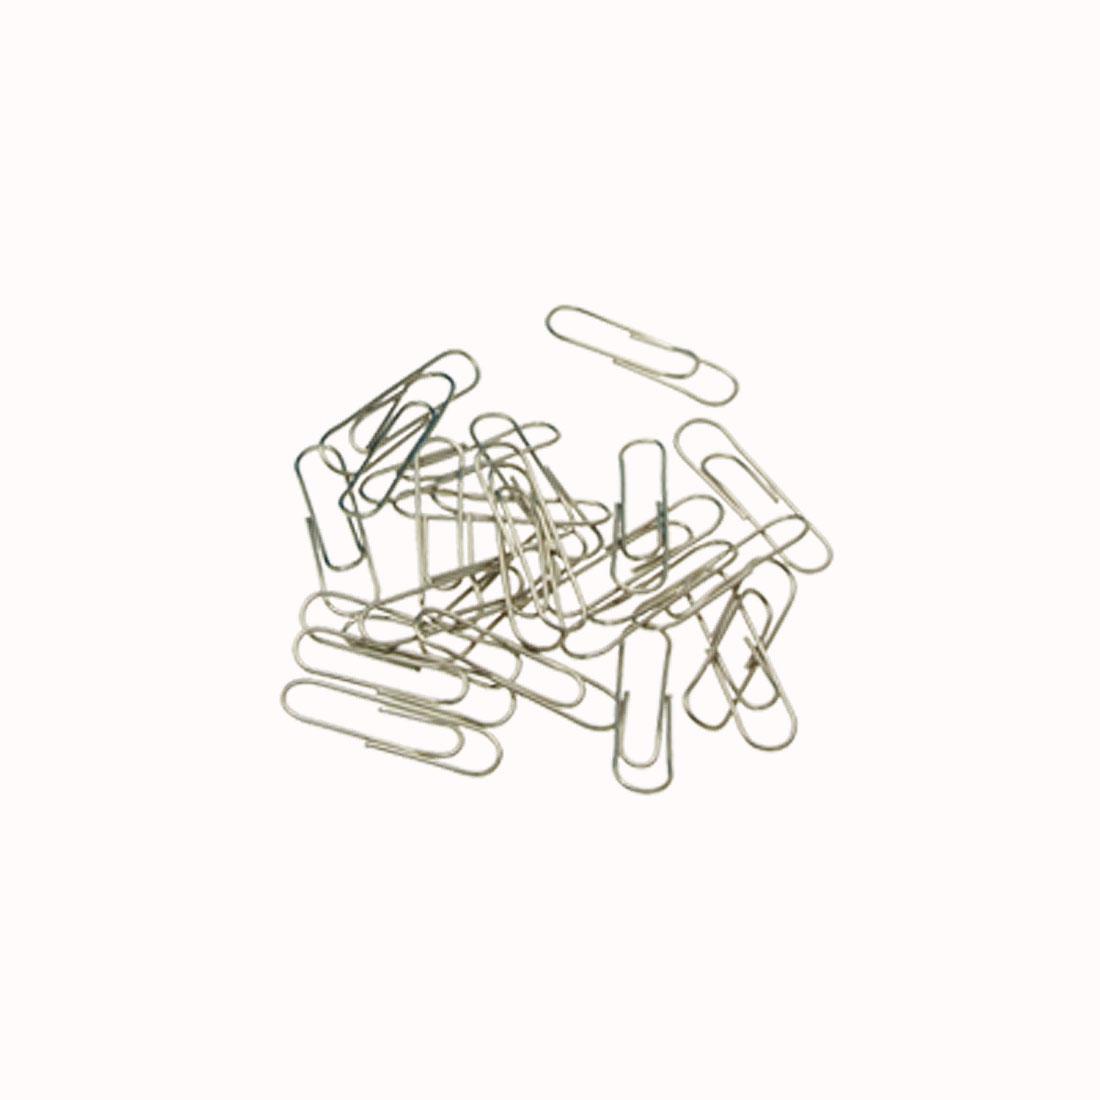 Silvery Mini Bookmark Paper Clips 1000 PCS